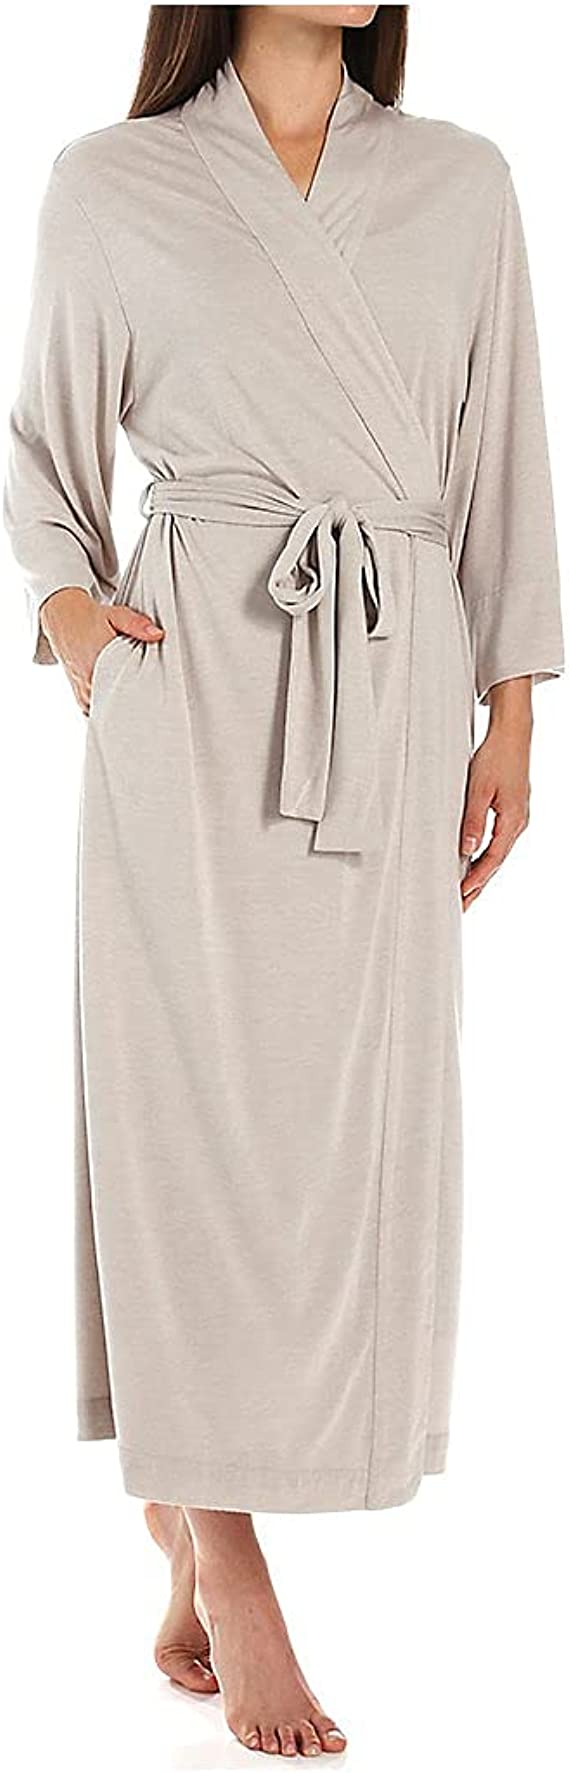 Natori Shangri La Long Robe with Kimono Sleeves, Bathrobe for Women